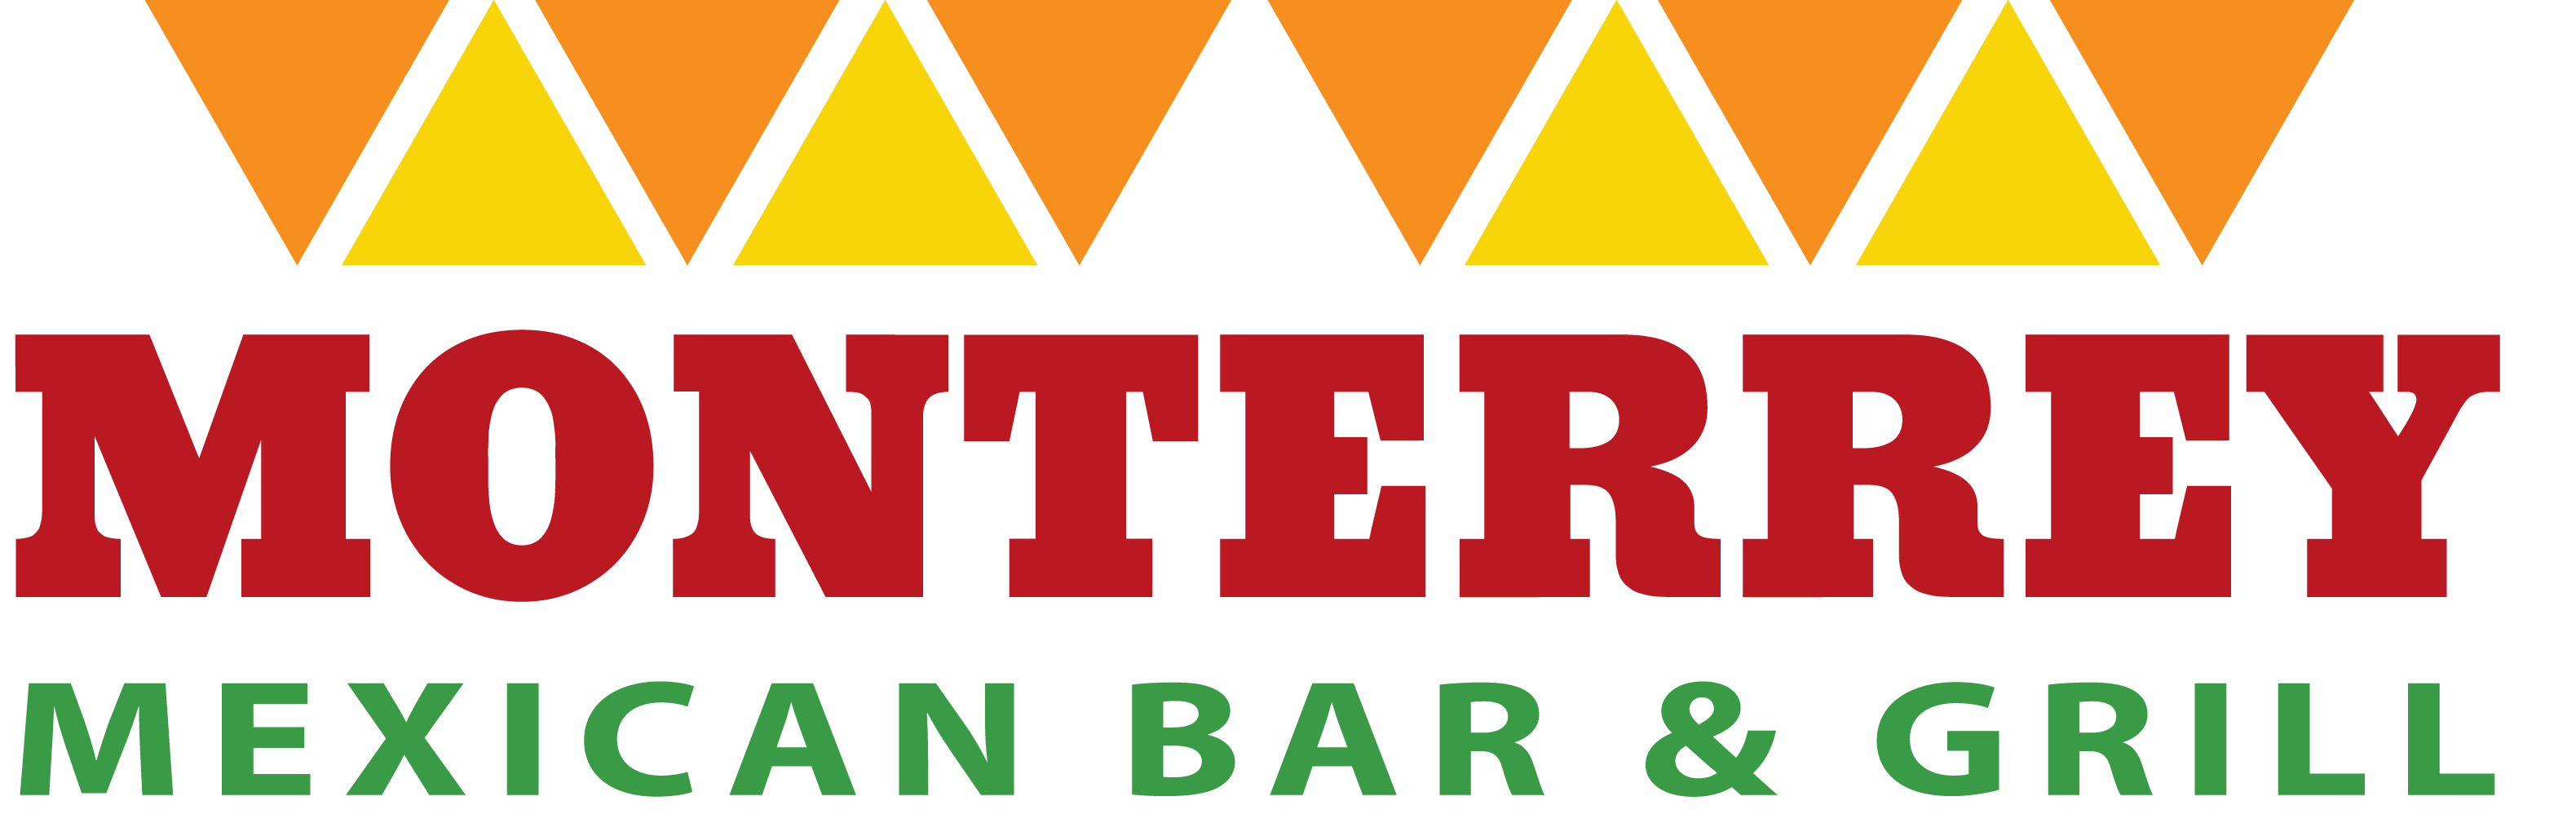 Monterrey Mexican Bar & Grill